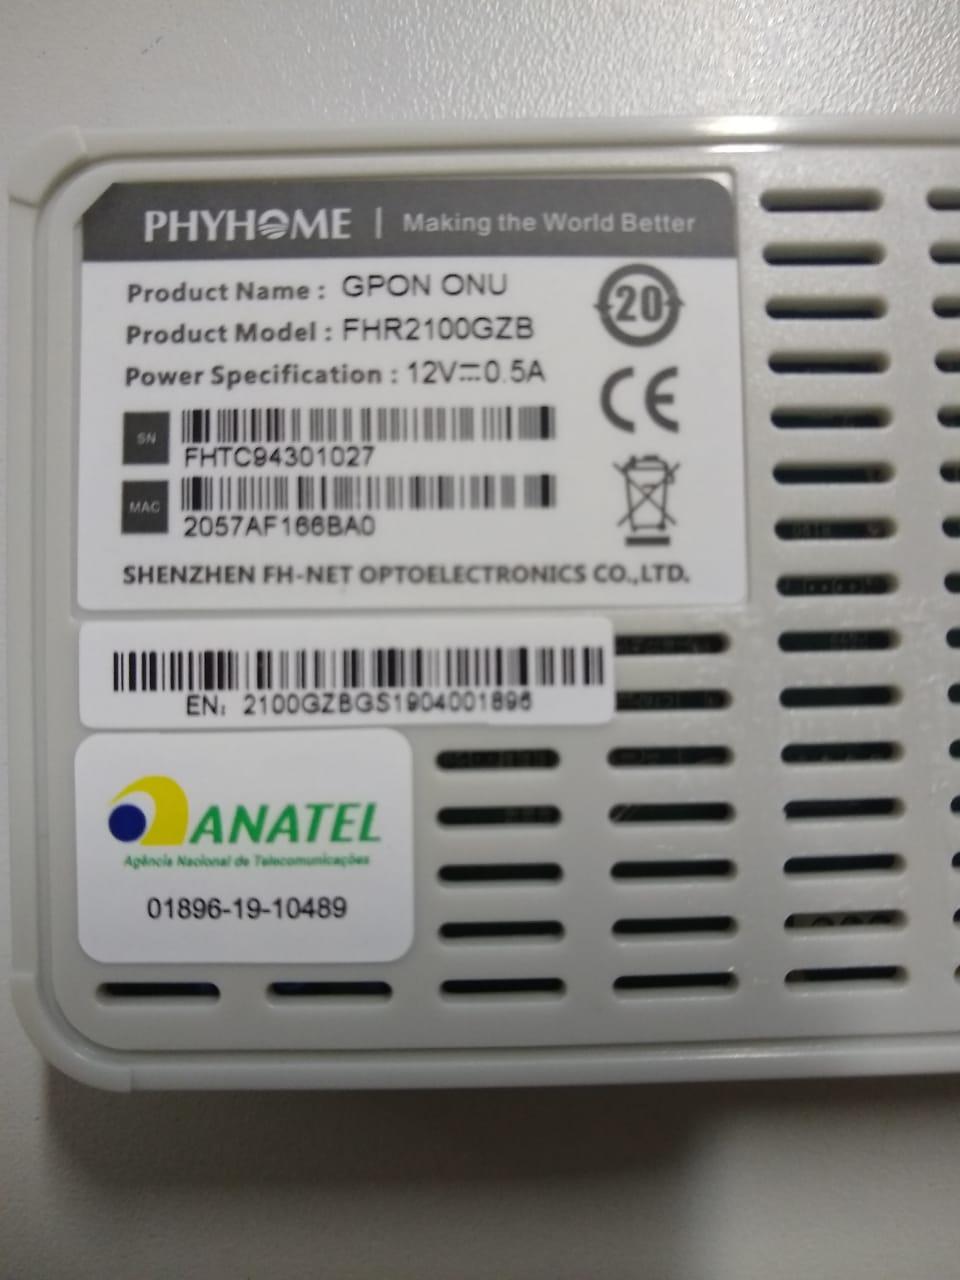 ONU GPON PhyHome Bridge / Router Gigabit (FHR2100GZB)  - ComputechLoja